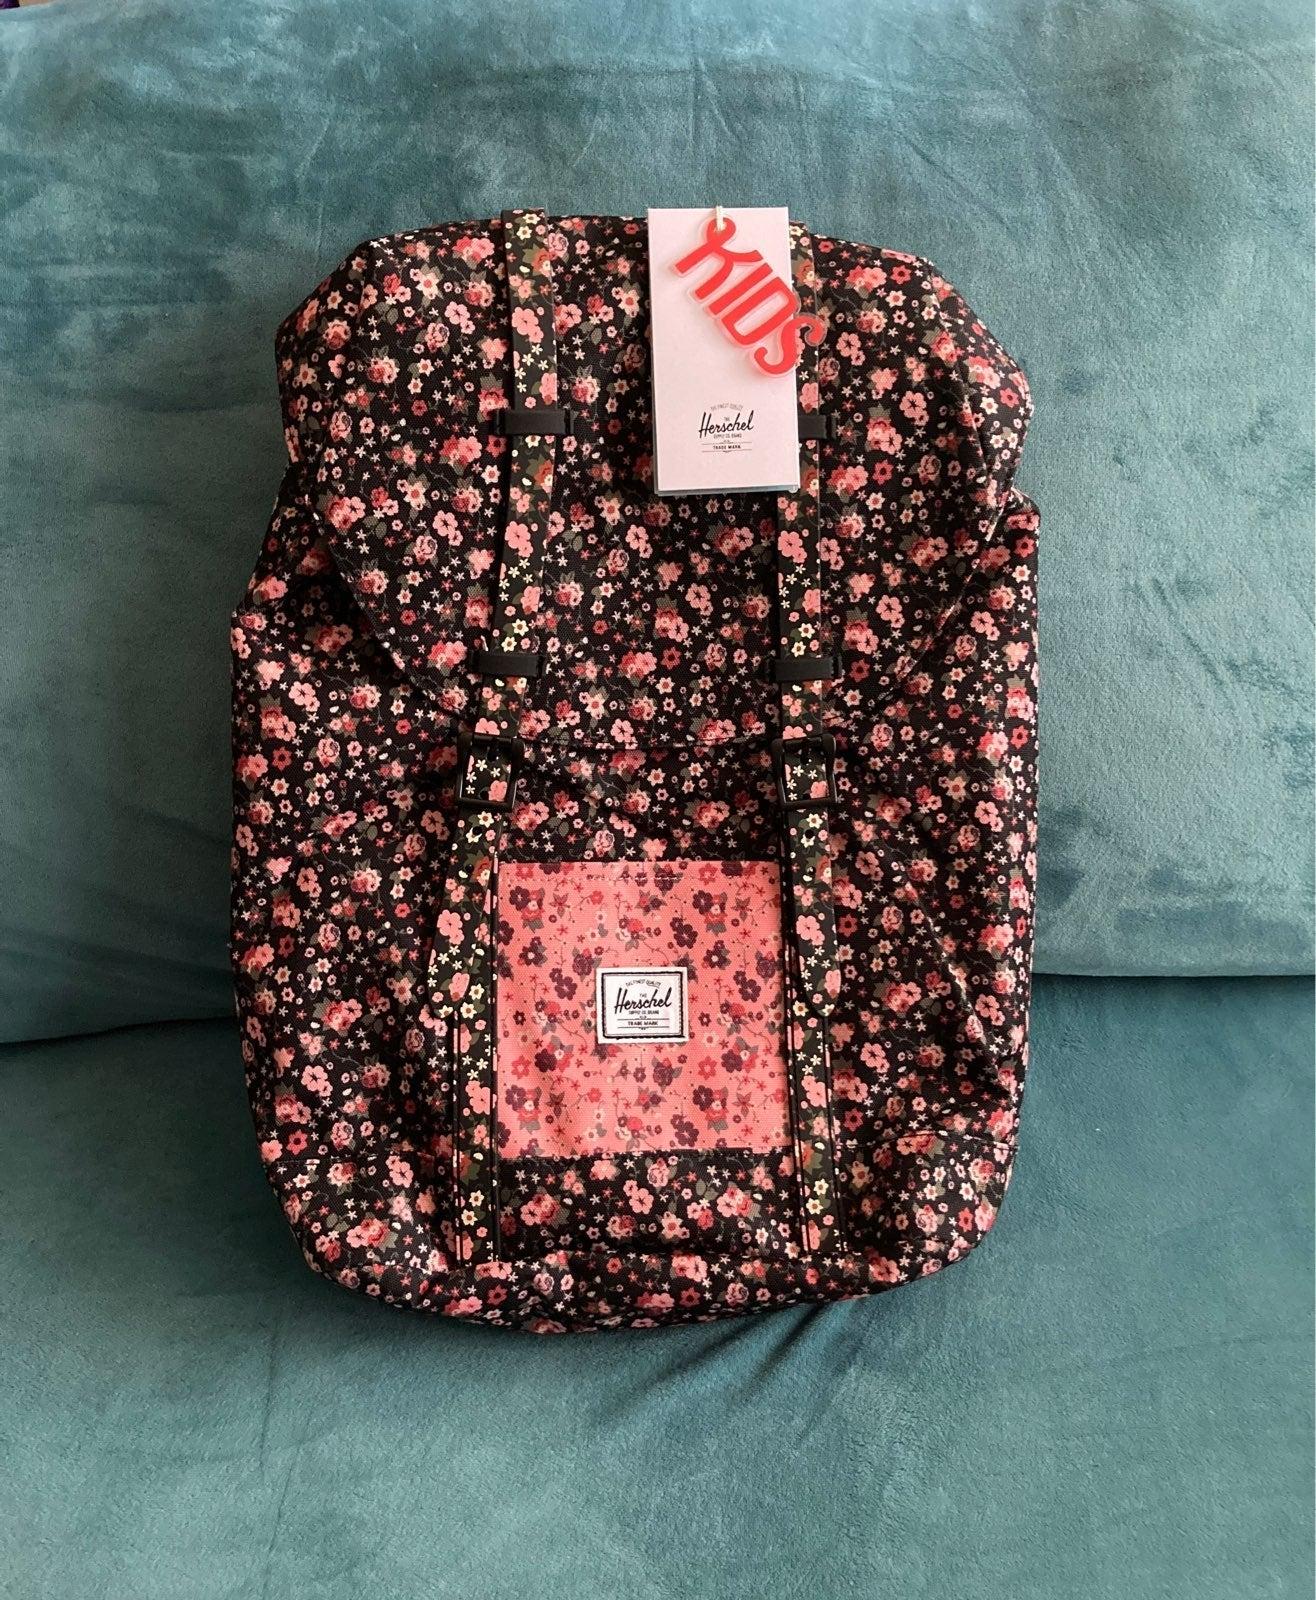 Brand new Hershel supply backpack